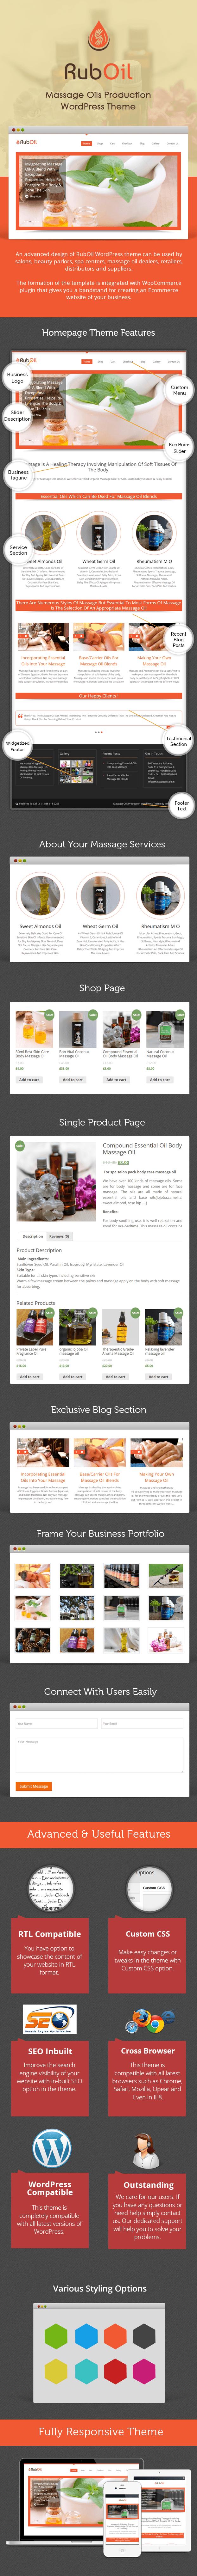 Massage Oils Production WP Theme